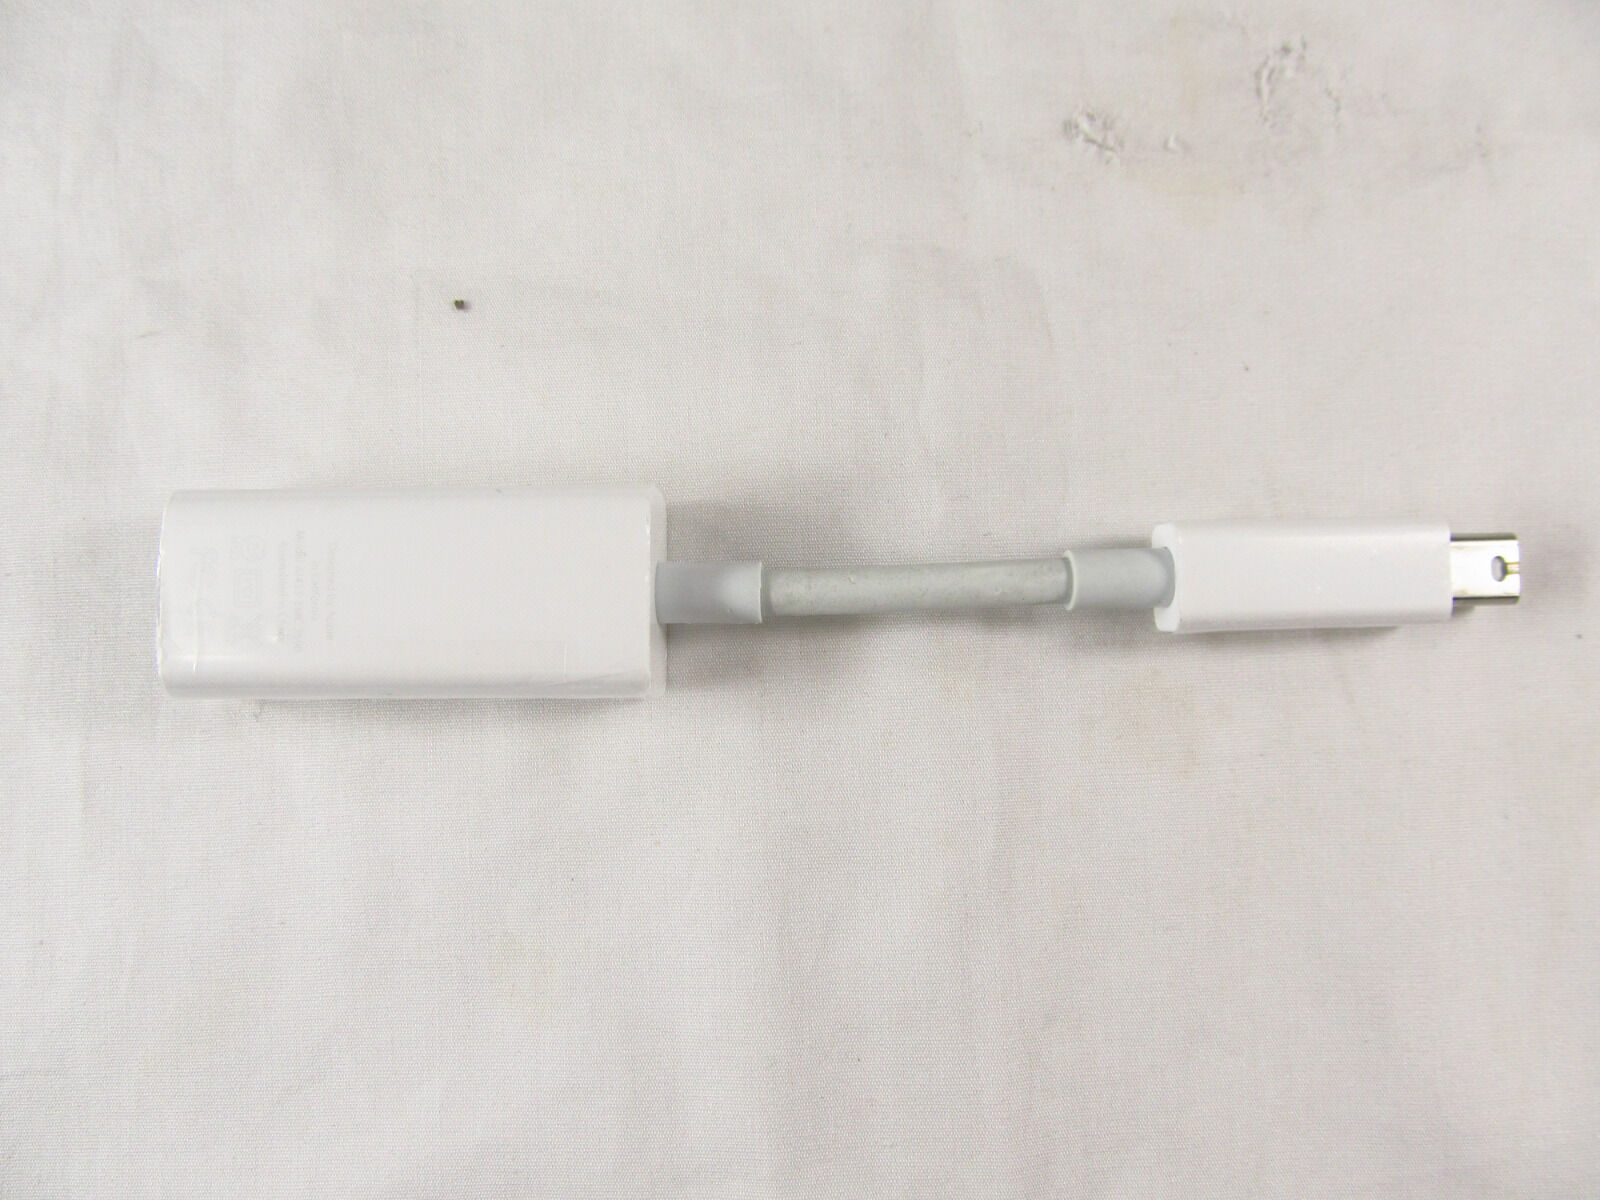 rj45 to thunderbolt electric water heater wiring diagram original genuine apple a1433 gigabit